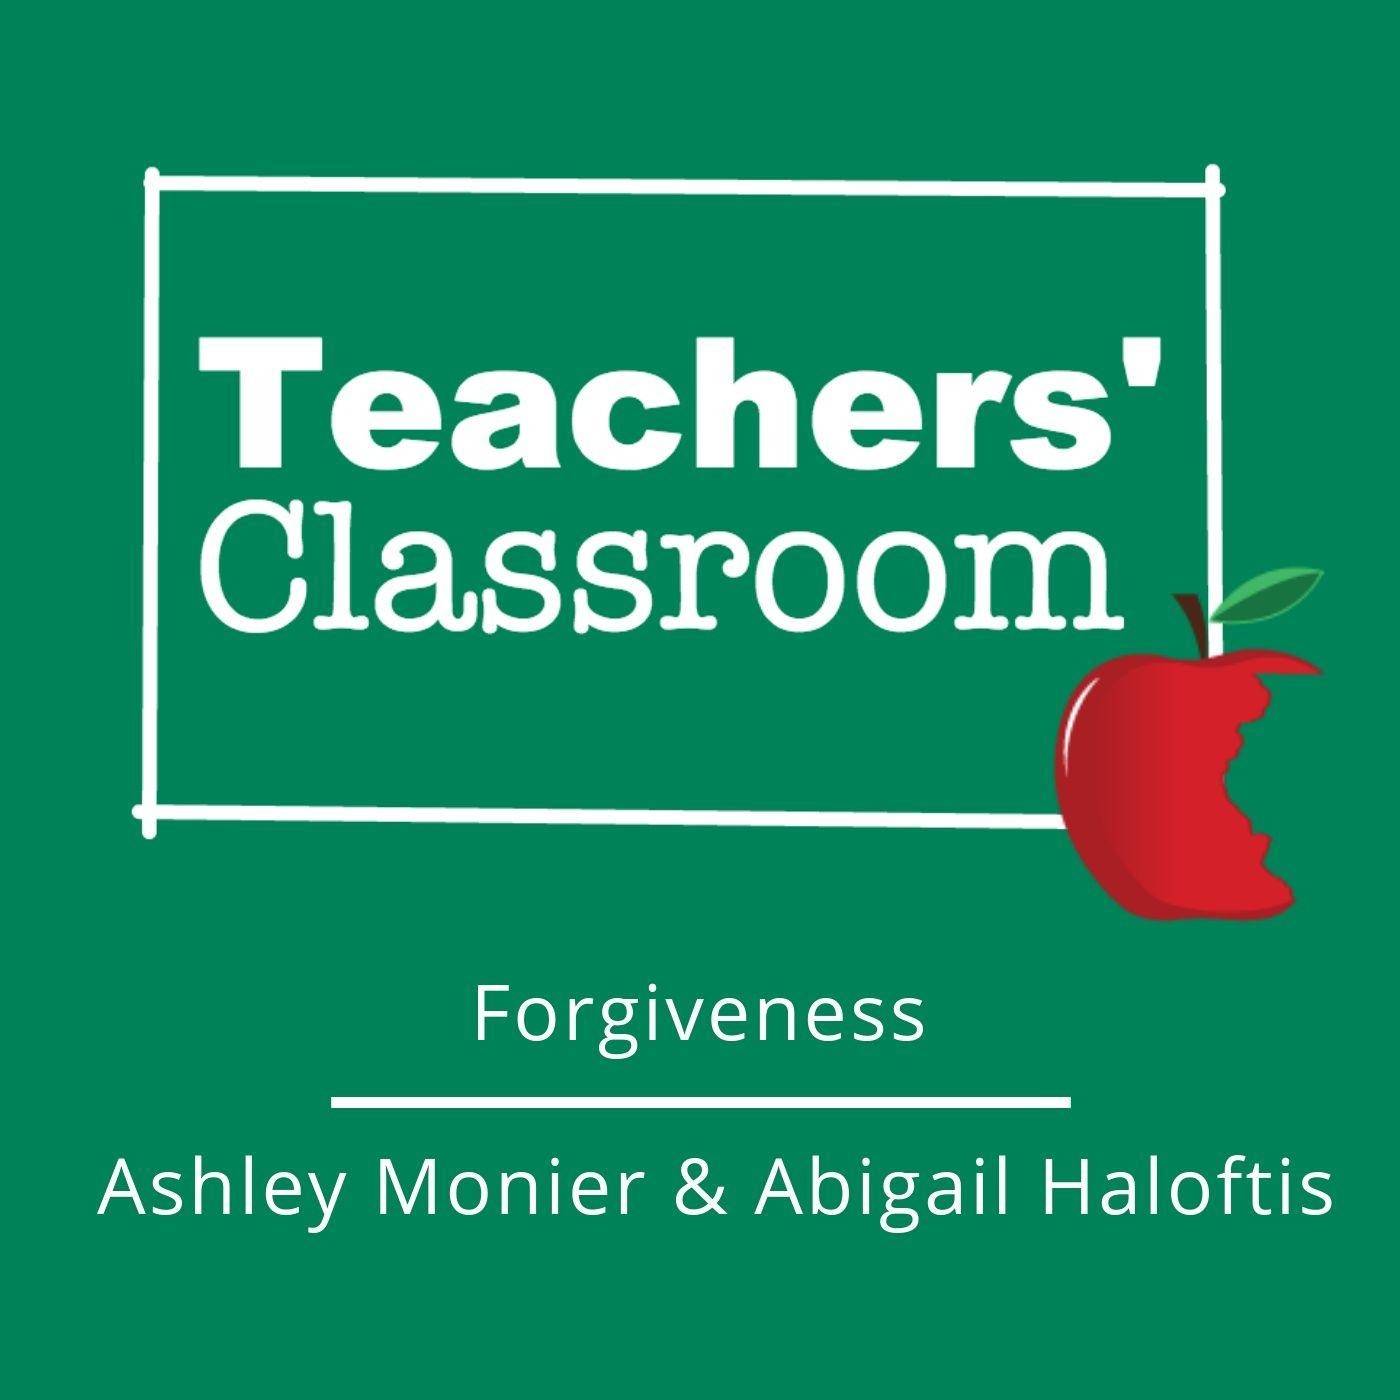 Forgiveness with Ashley Monier and Abigail Haloftis